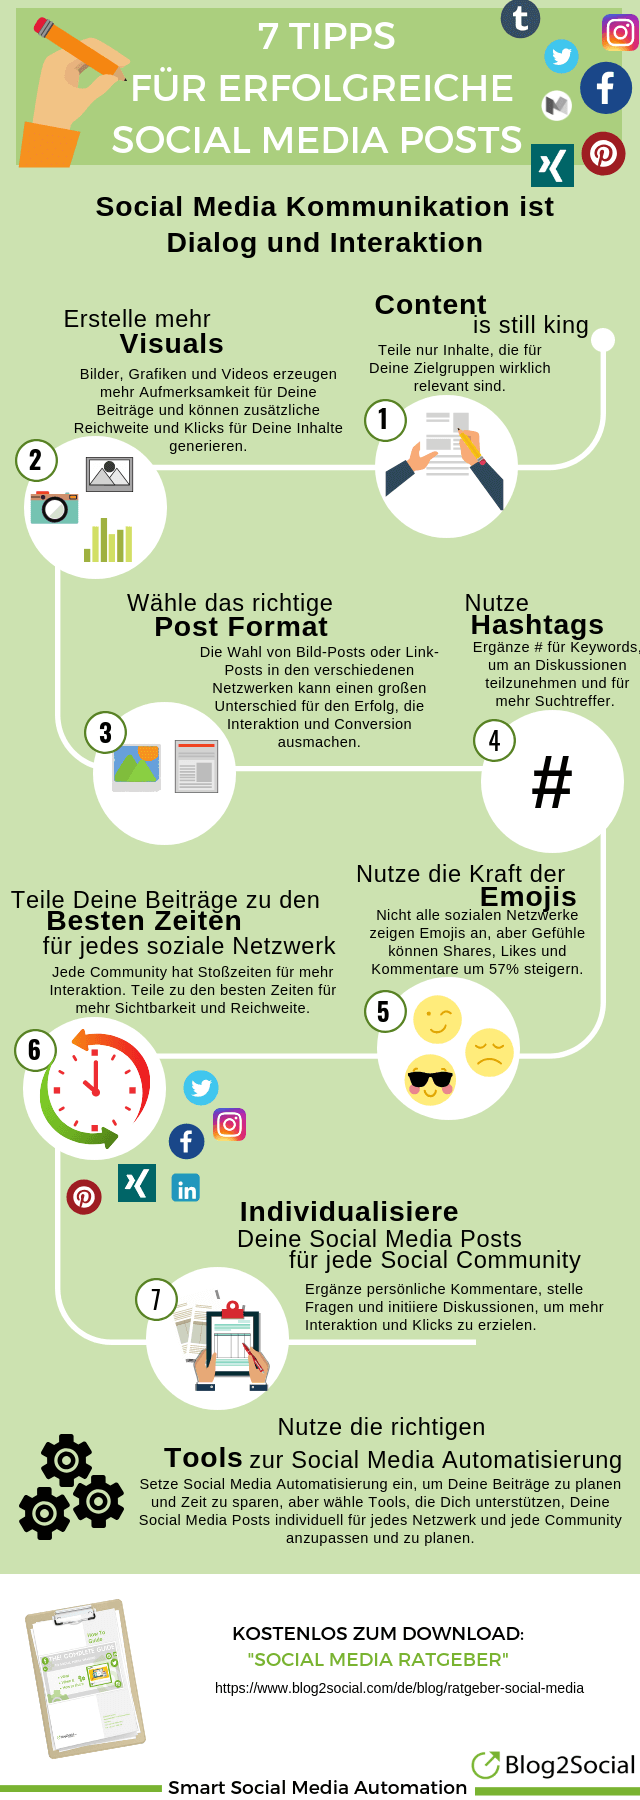 Quelle: https://www.blog2social.com/de/blog/erfolgreiche-social-media-beitraege/